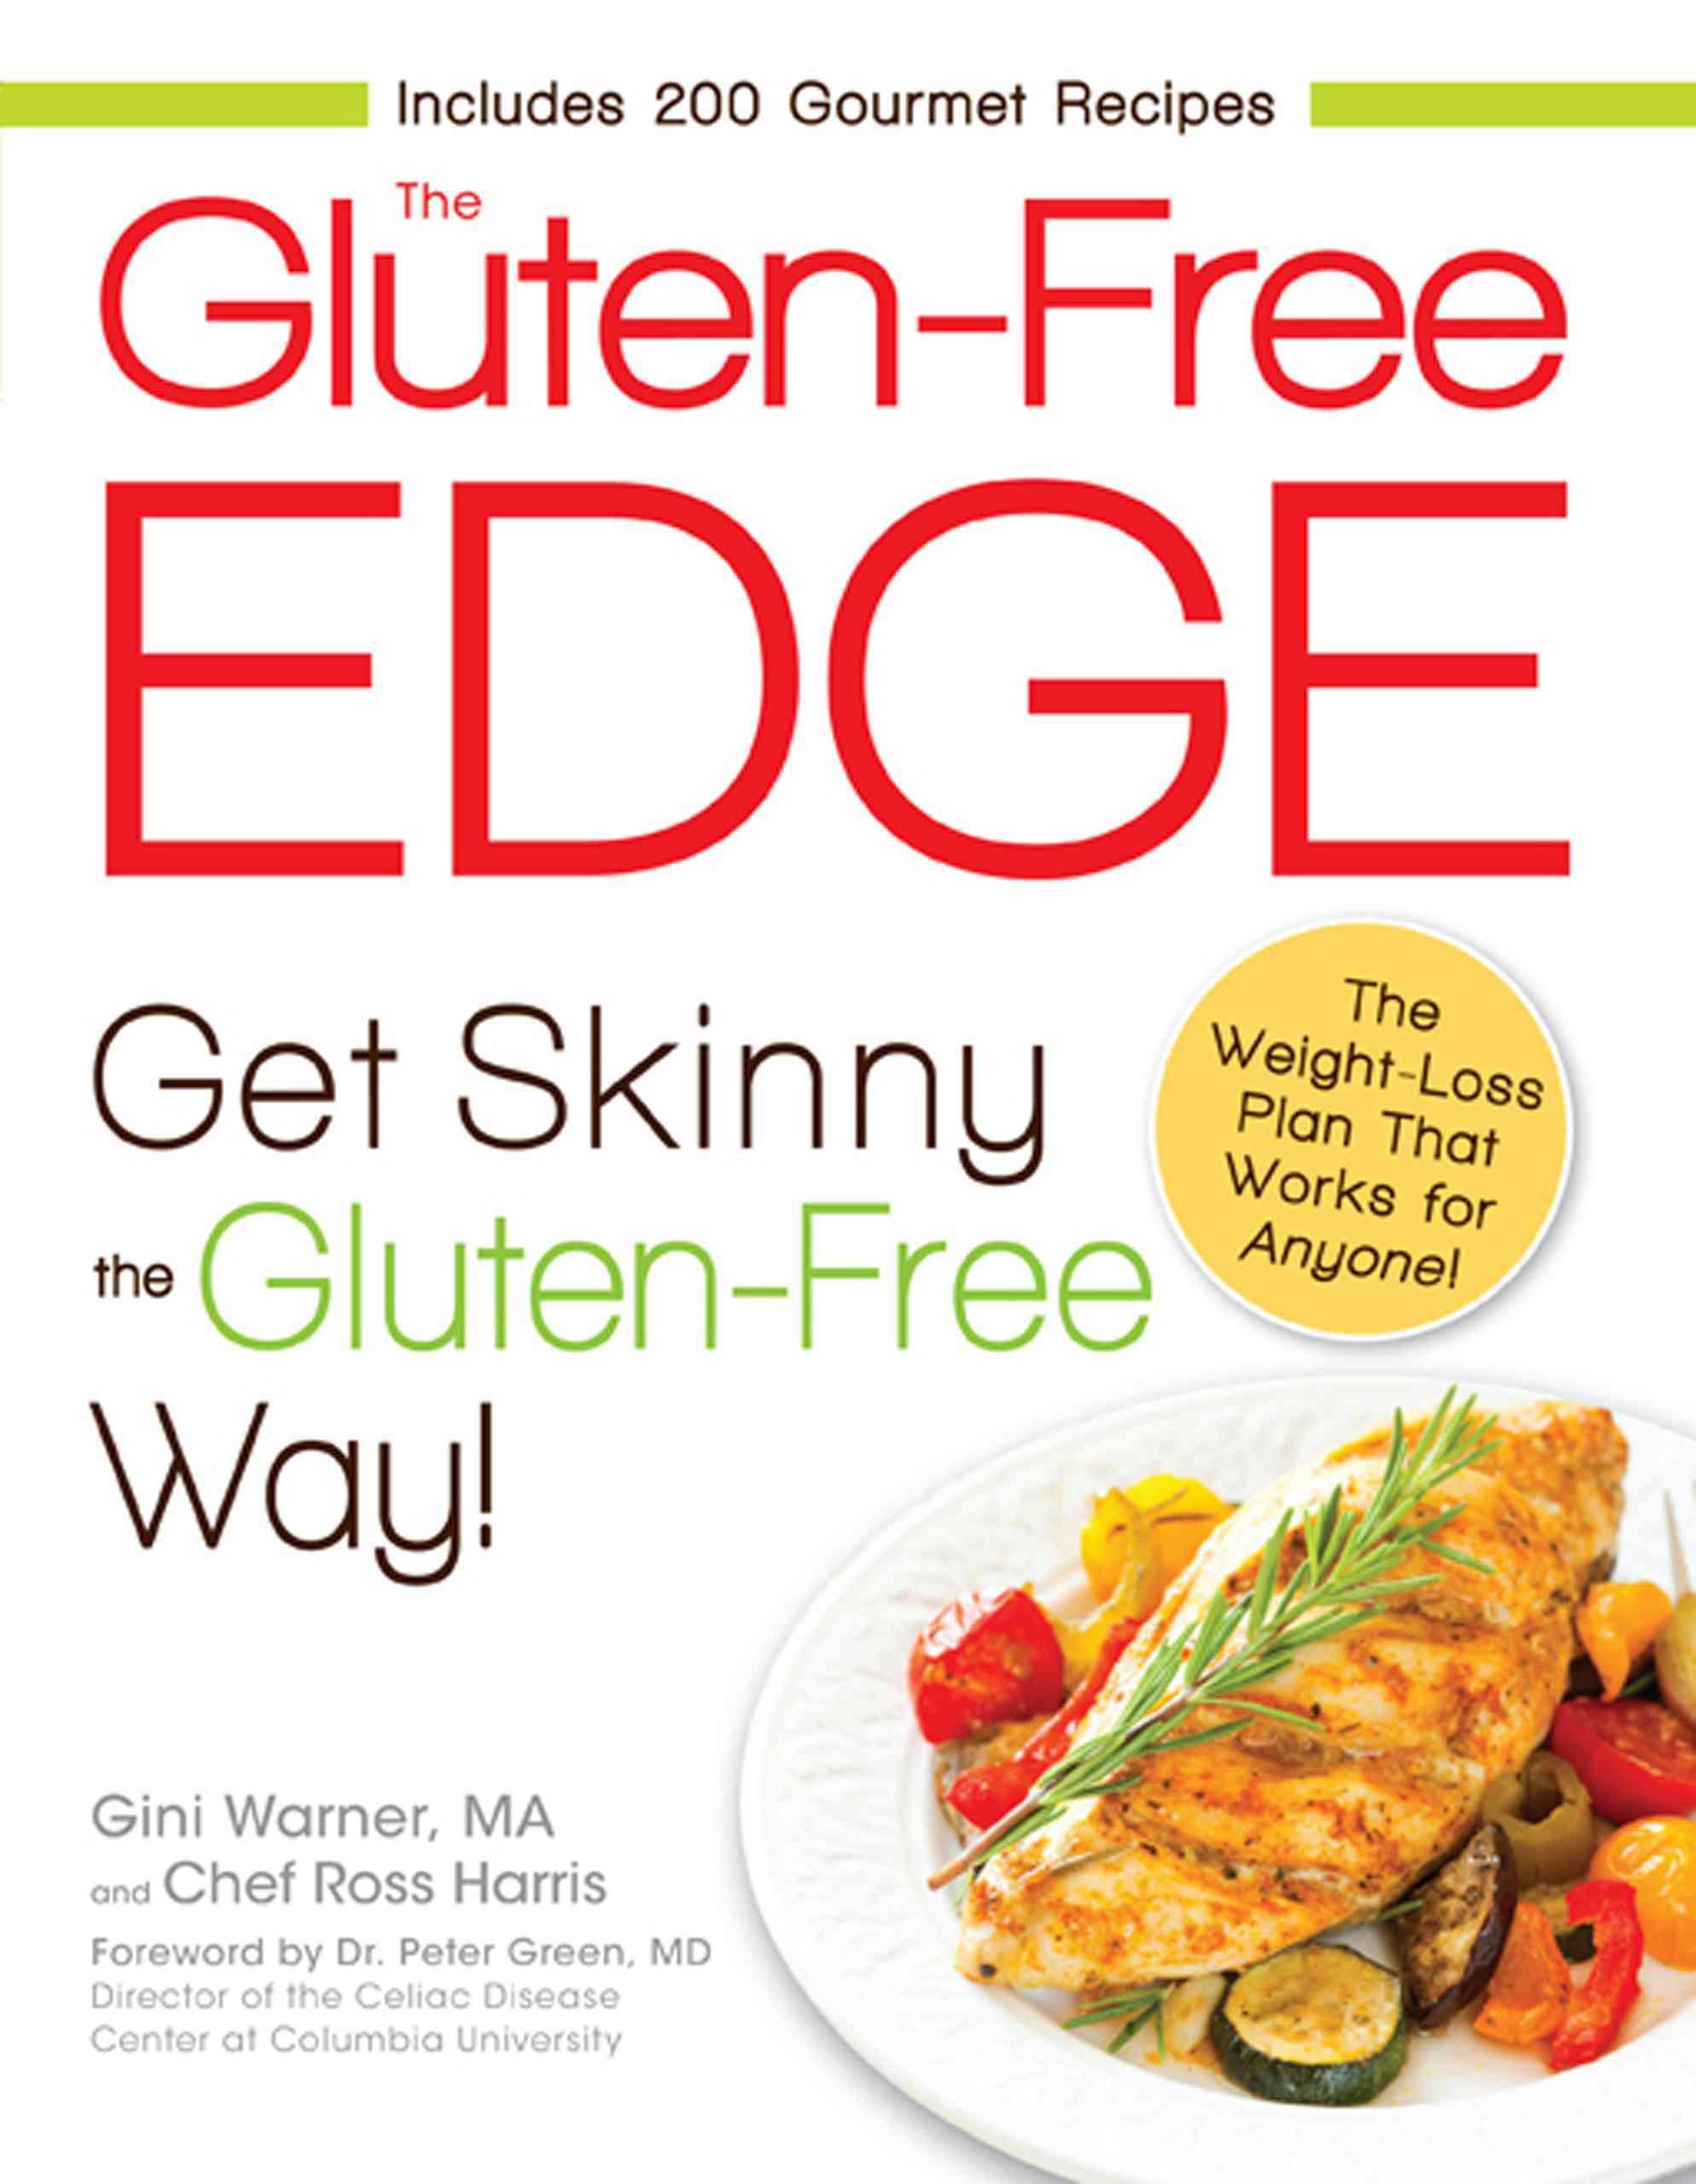 The Gluten-Free Edge: Get Skinny the Gluten-Free Way! (Paperback)